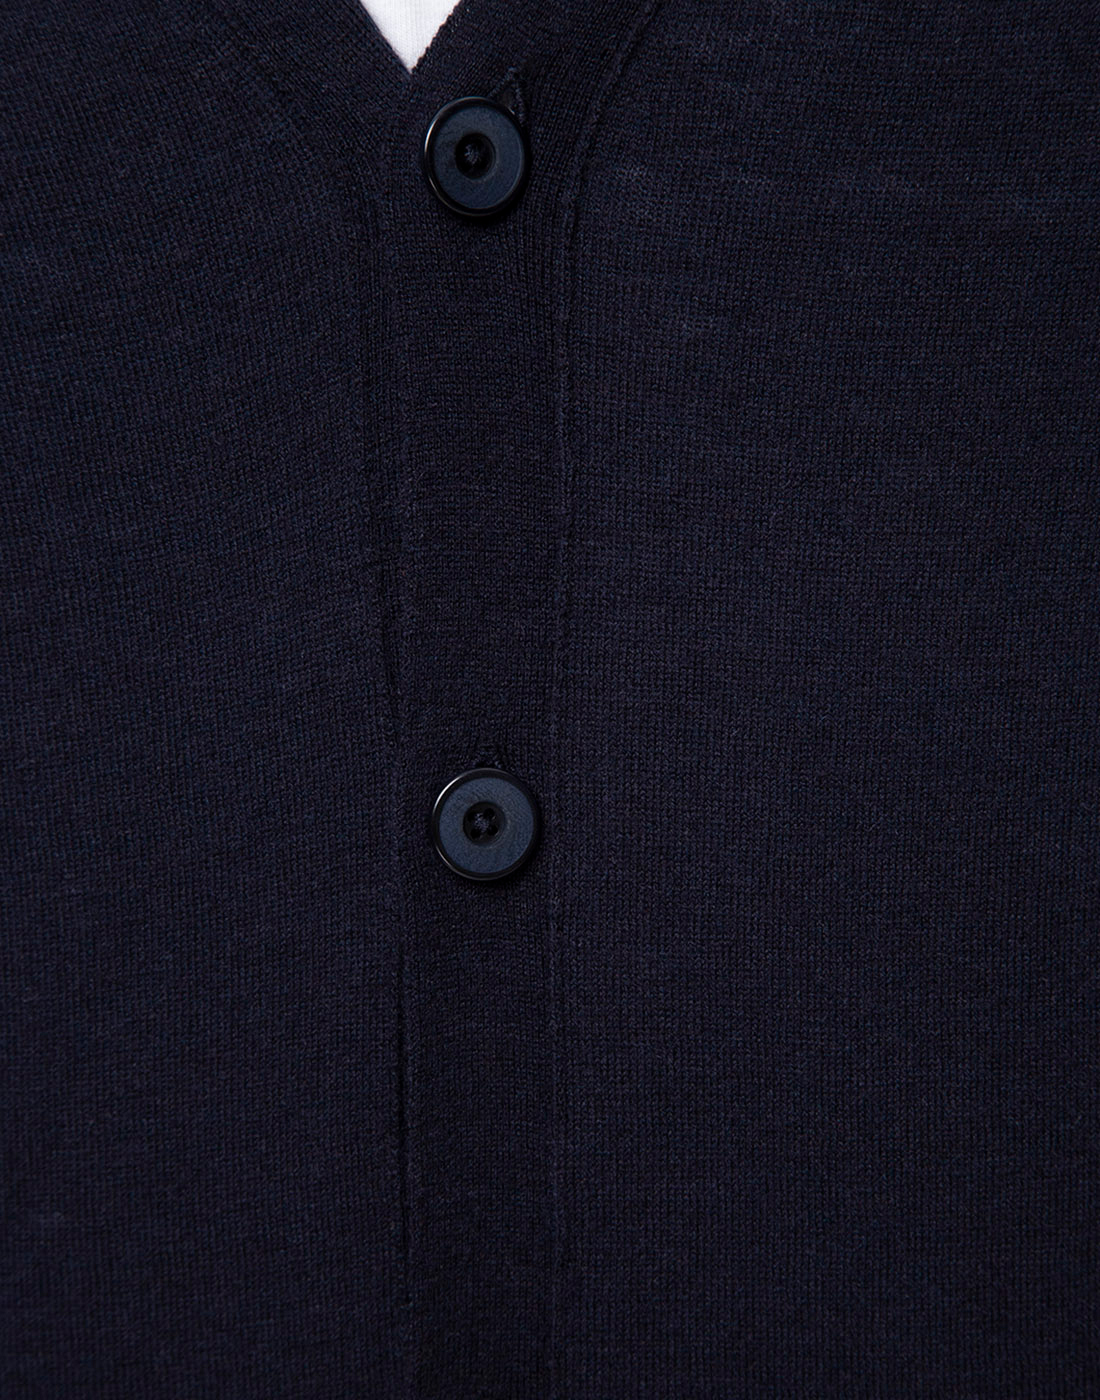 Мужской темно-синий шерстяной кардиган